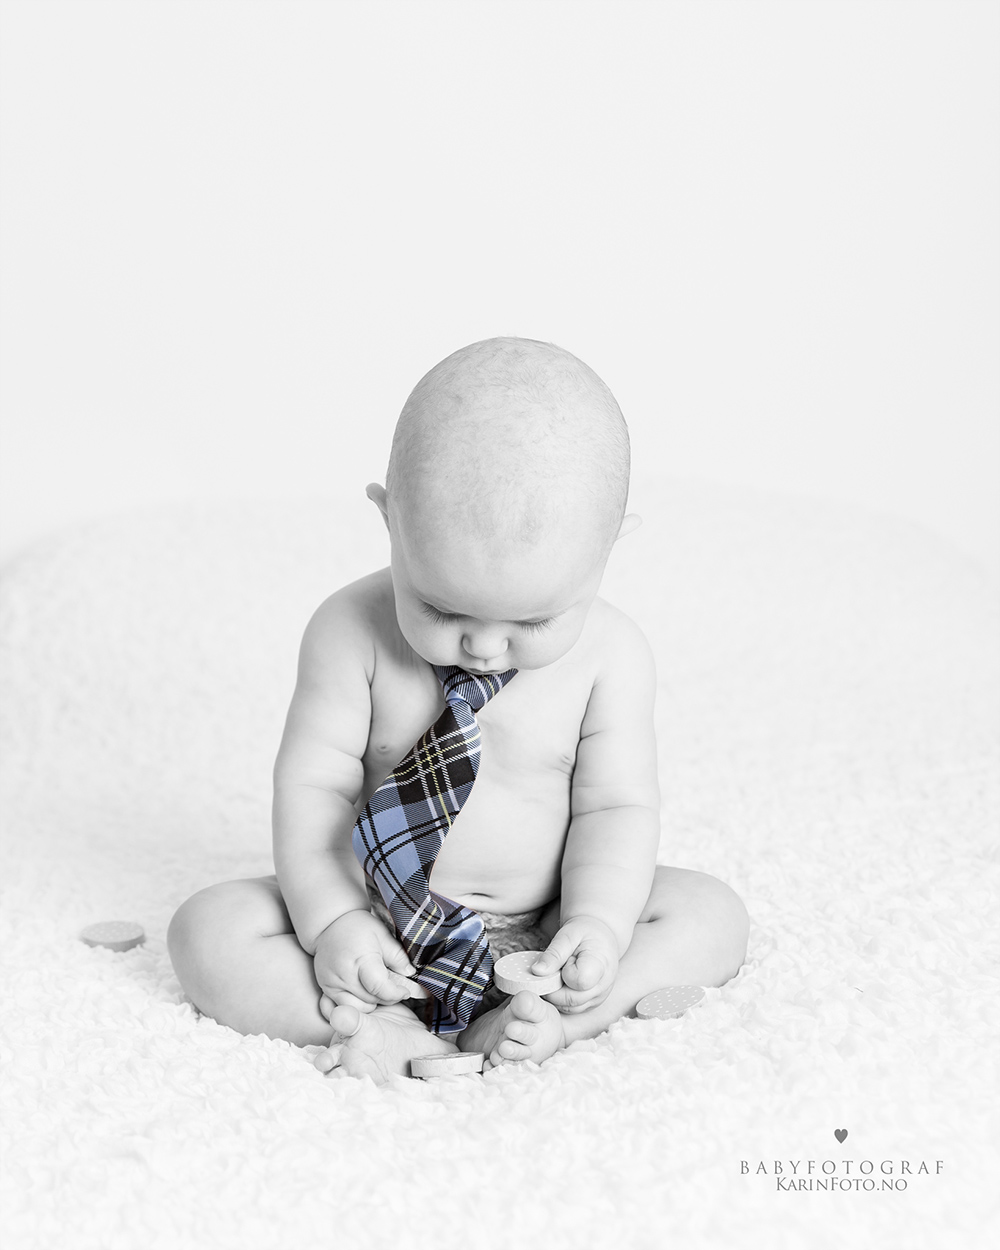 Babyfotografering,sarpsborg,østfold